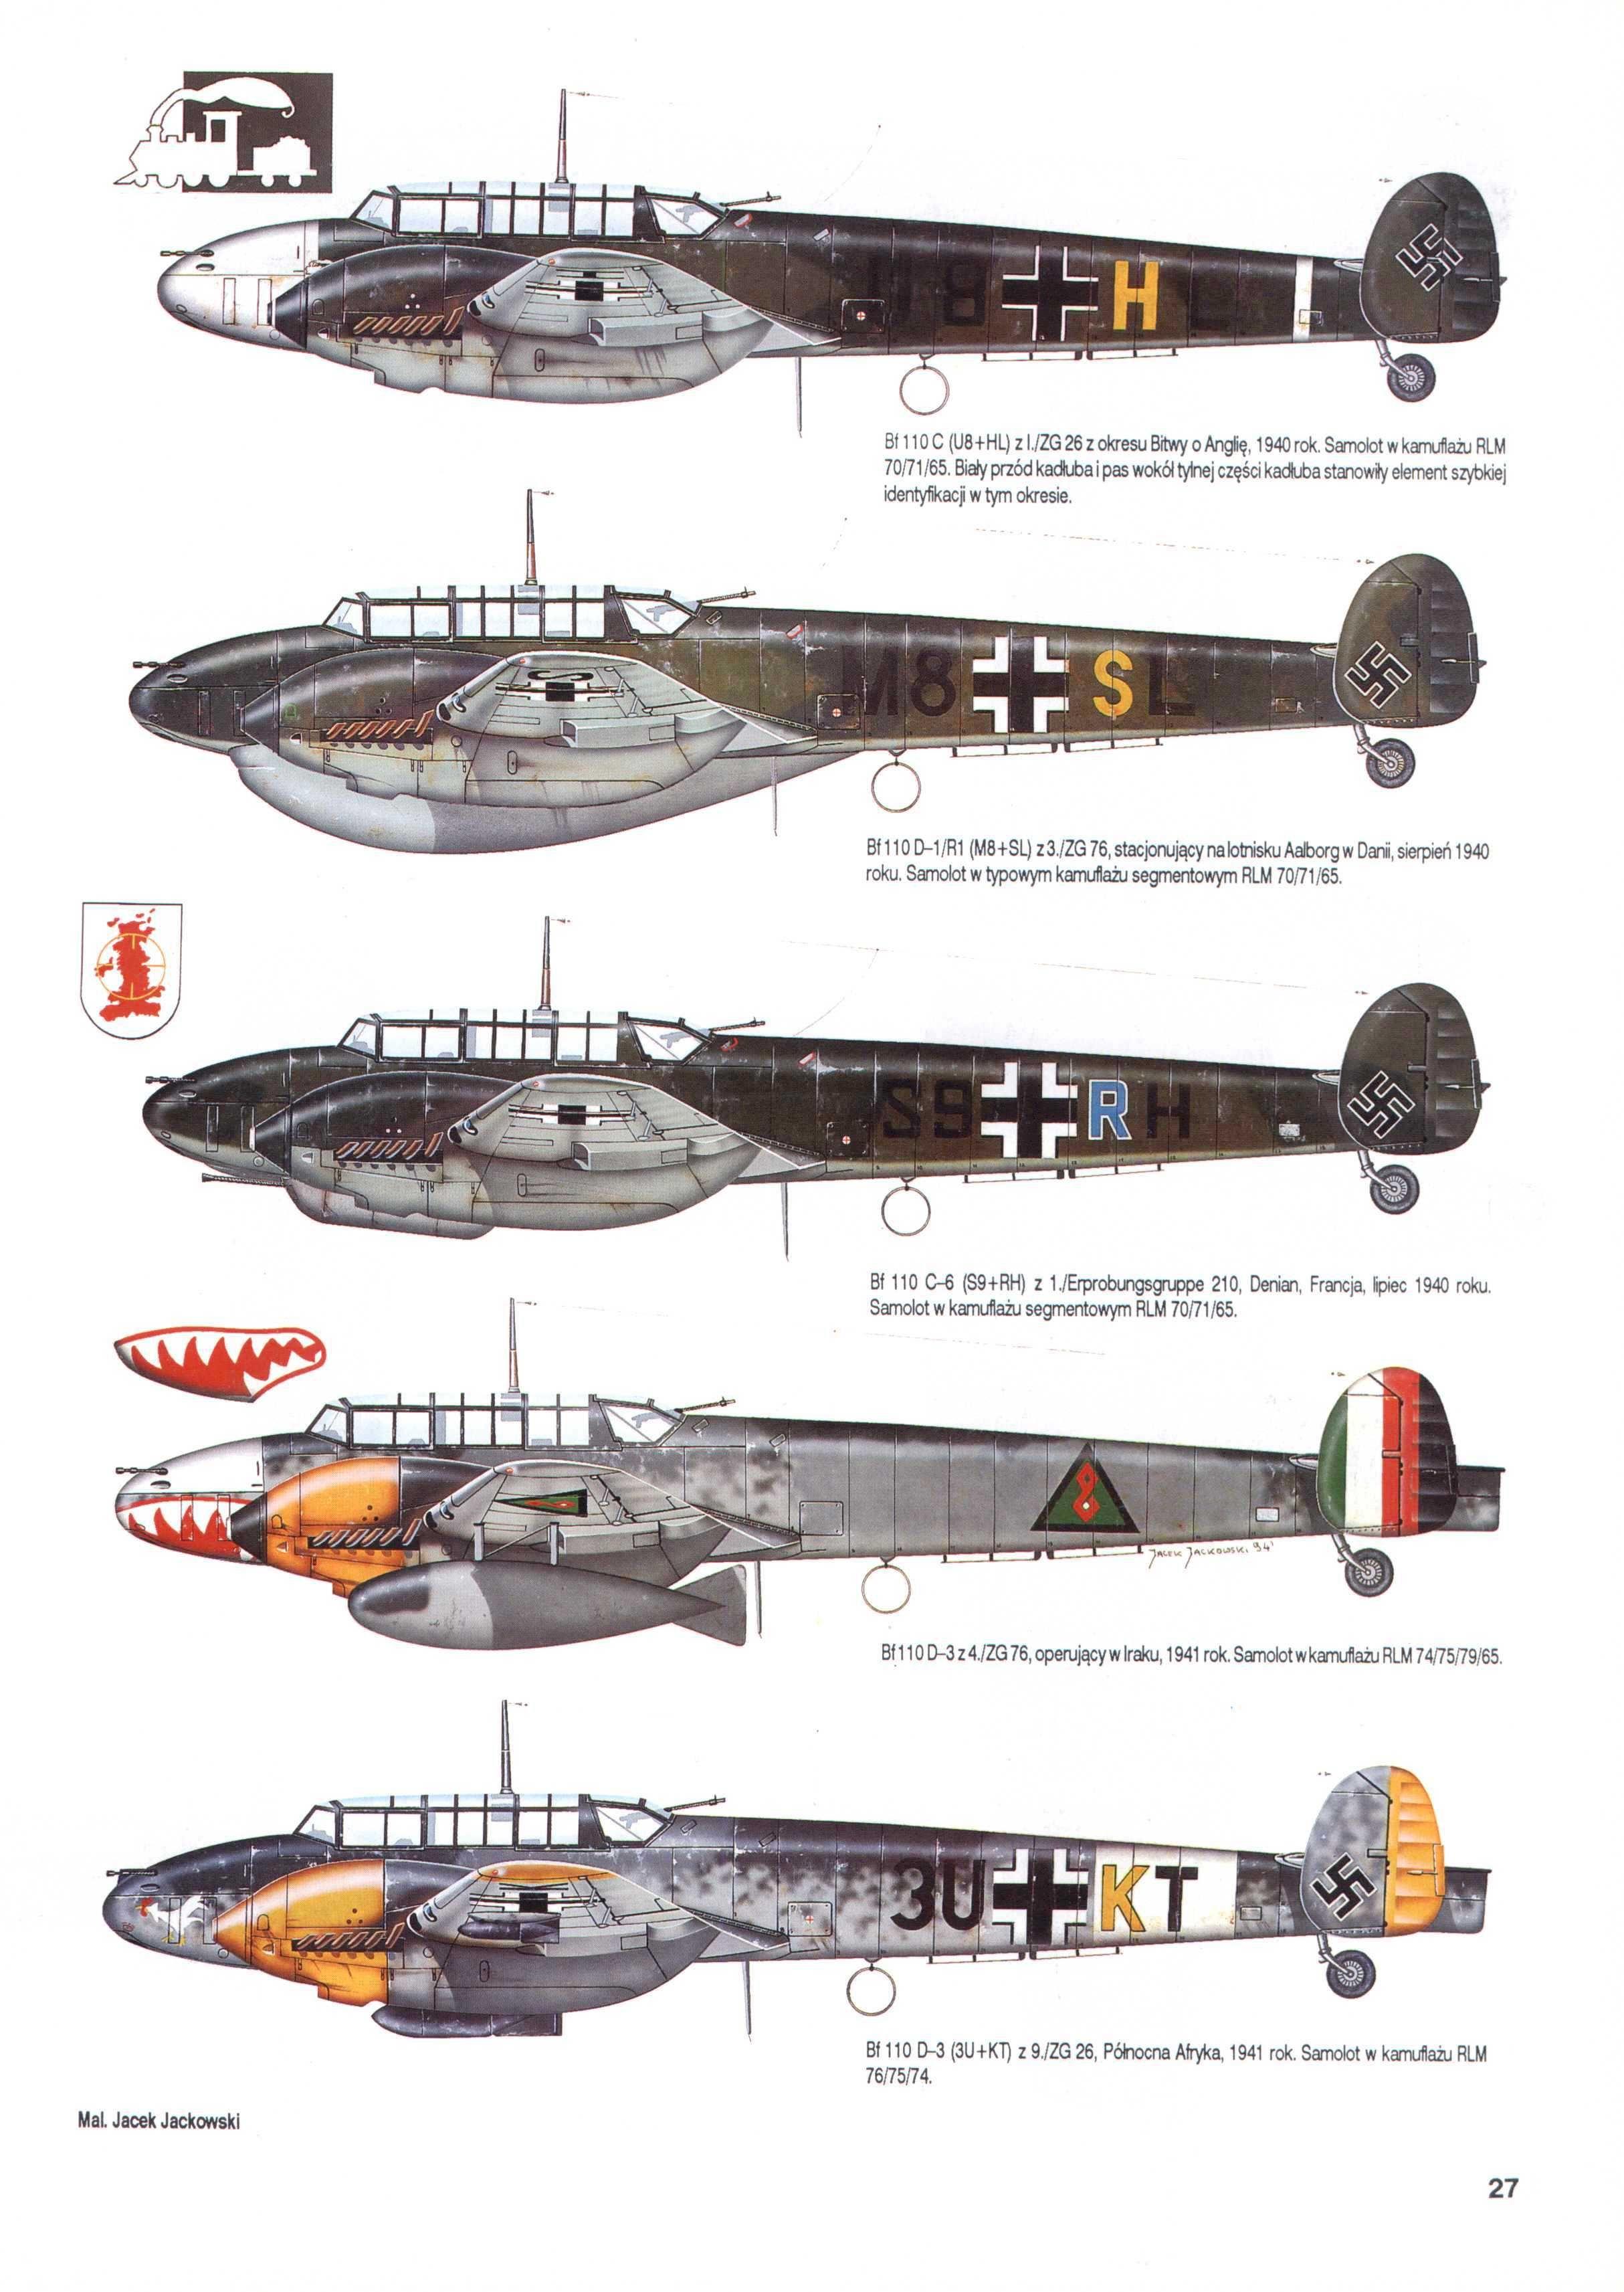 Pin On Aircraft Color Profiles In Comparison